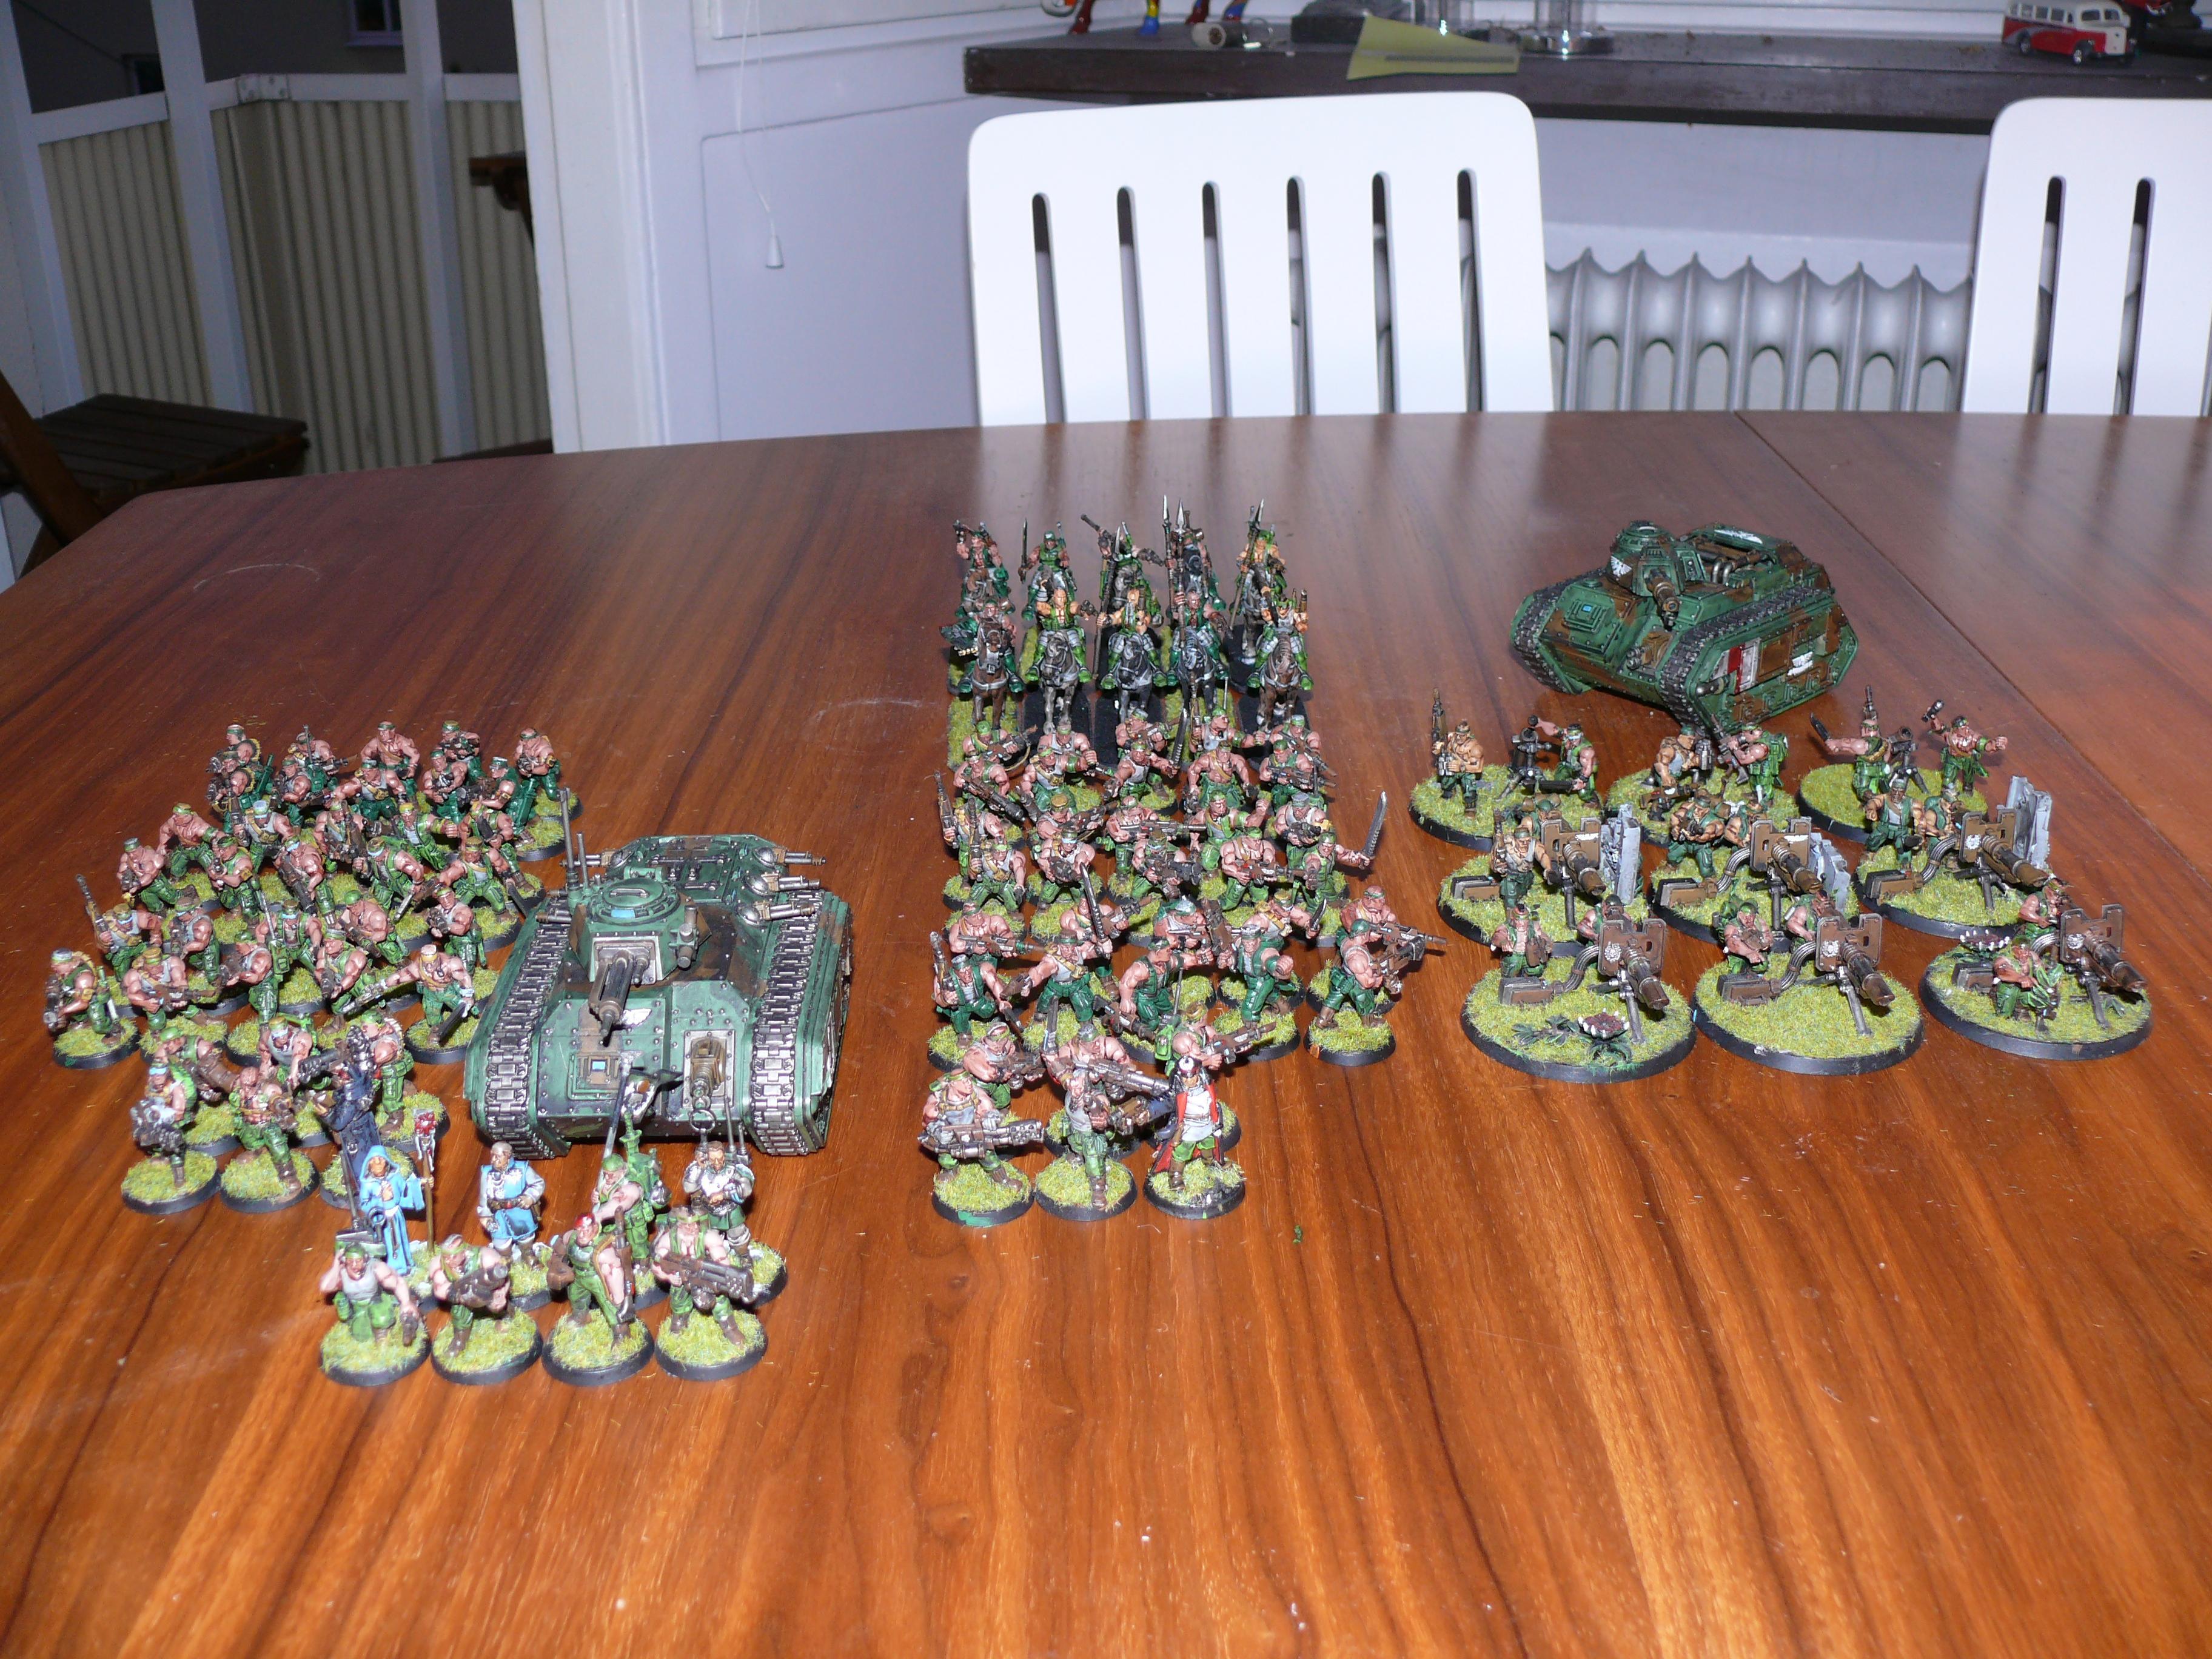 Army, Catachan, Chimera, Guardsmen, Heavy Weapon Team, Hellhound, Imperial Guard, Lascannon, Mortals, Rough Riders